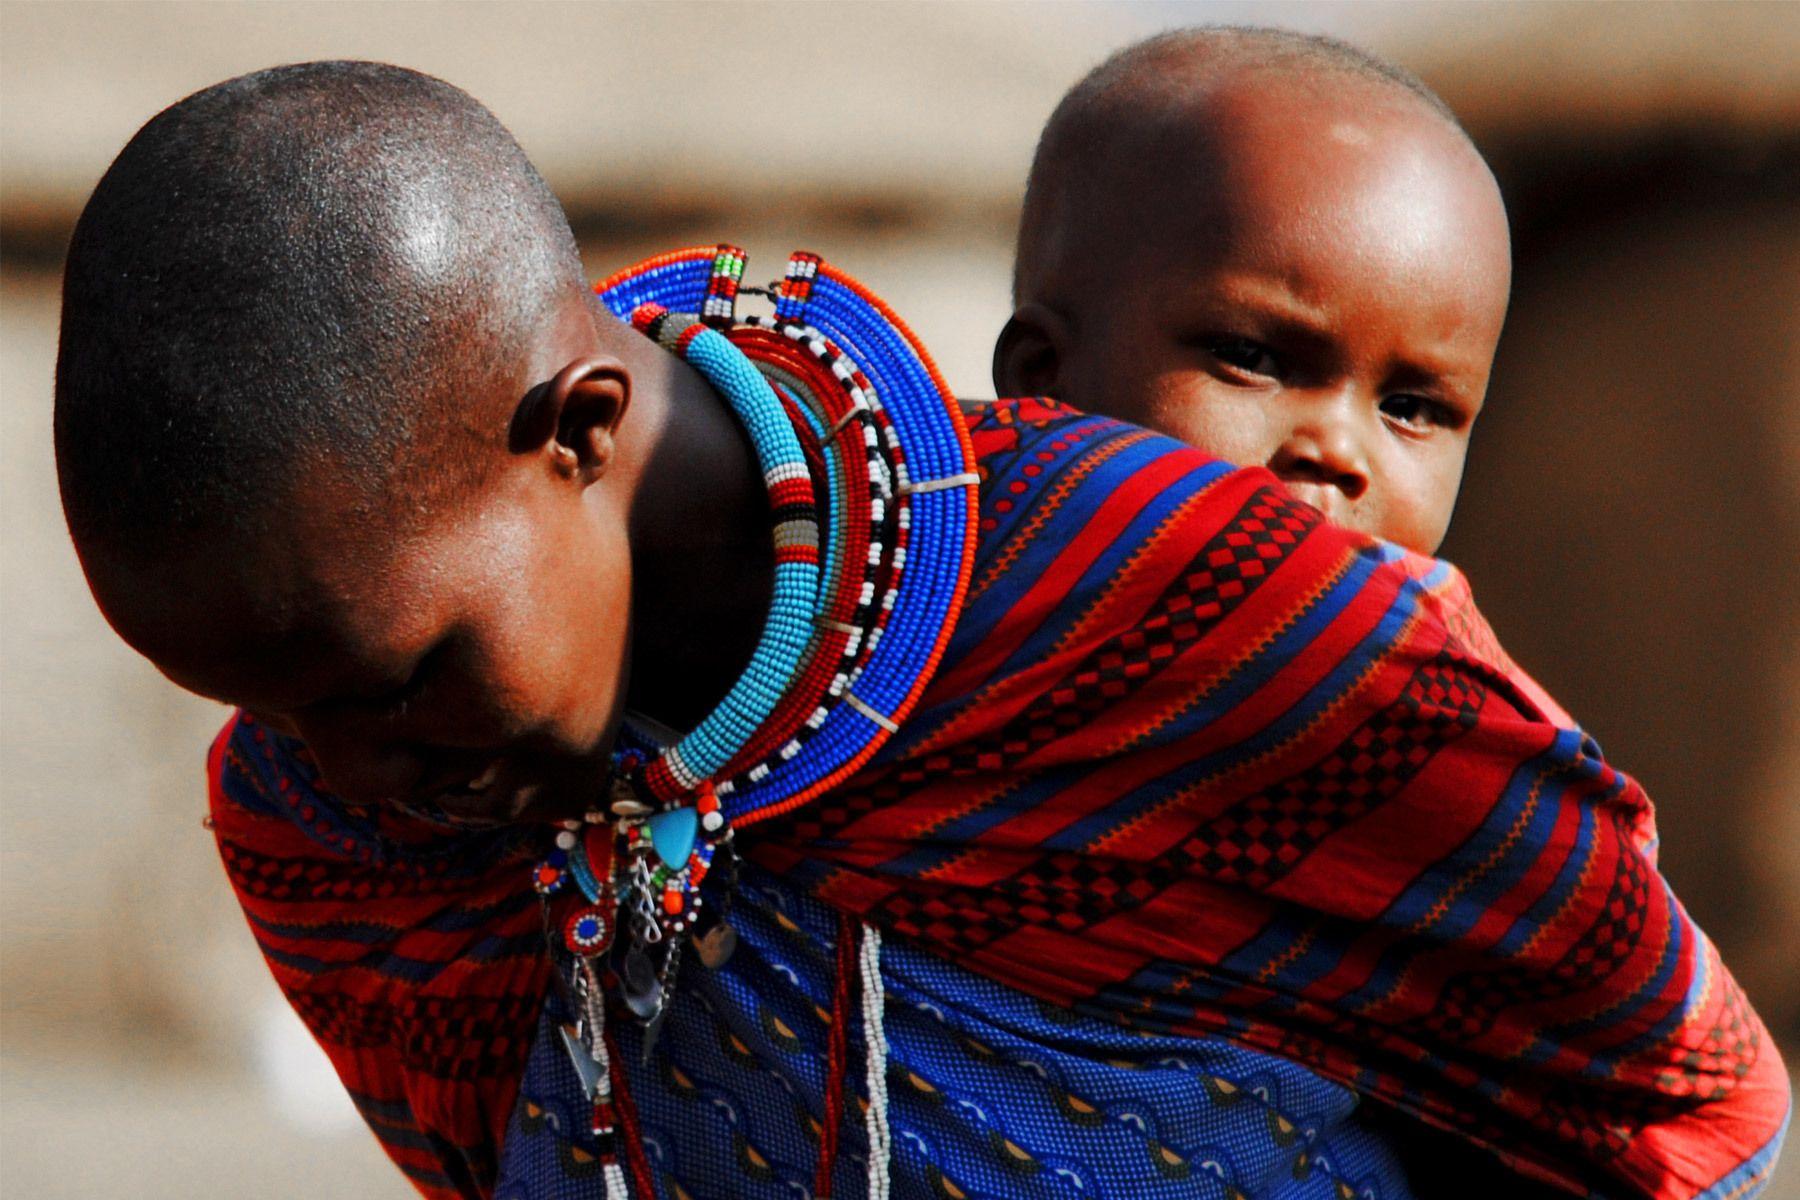 102___africa_kenya_maasai.jpg